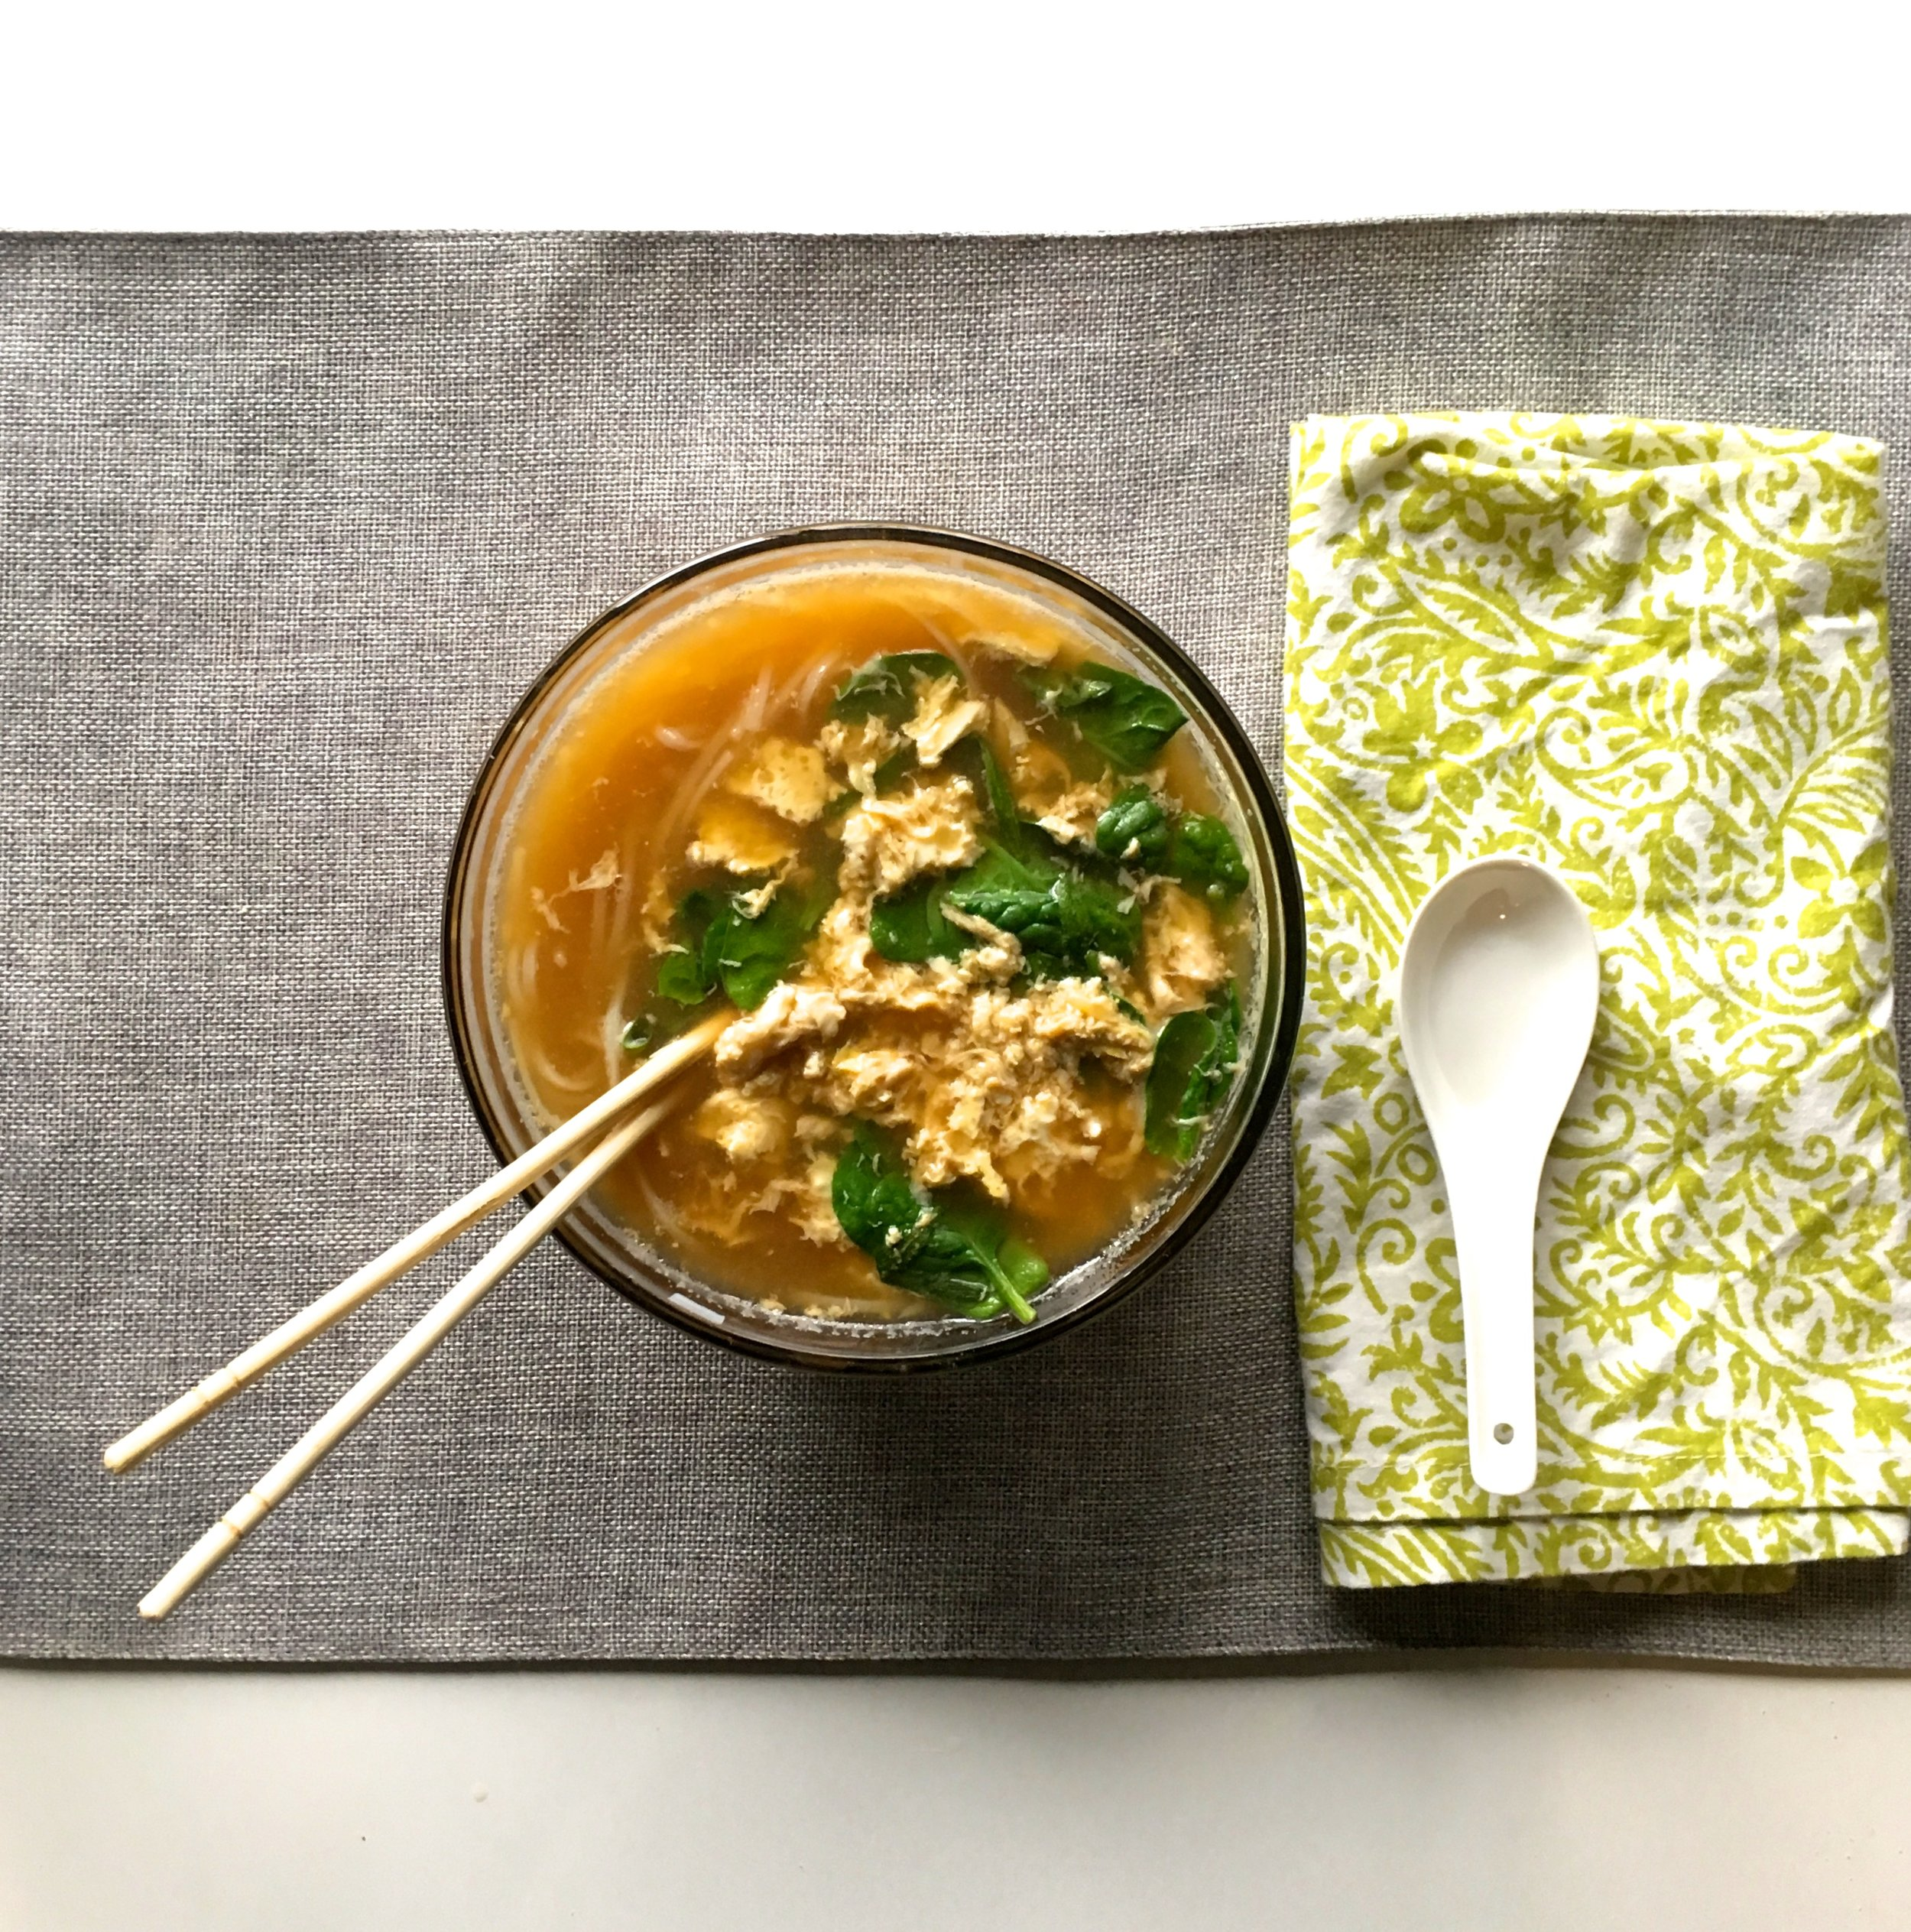 Easy Asian Noodle Soup (3 steps!)